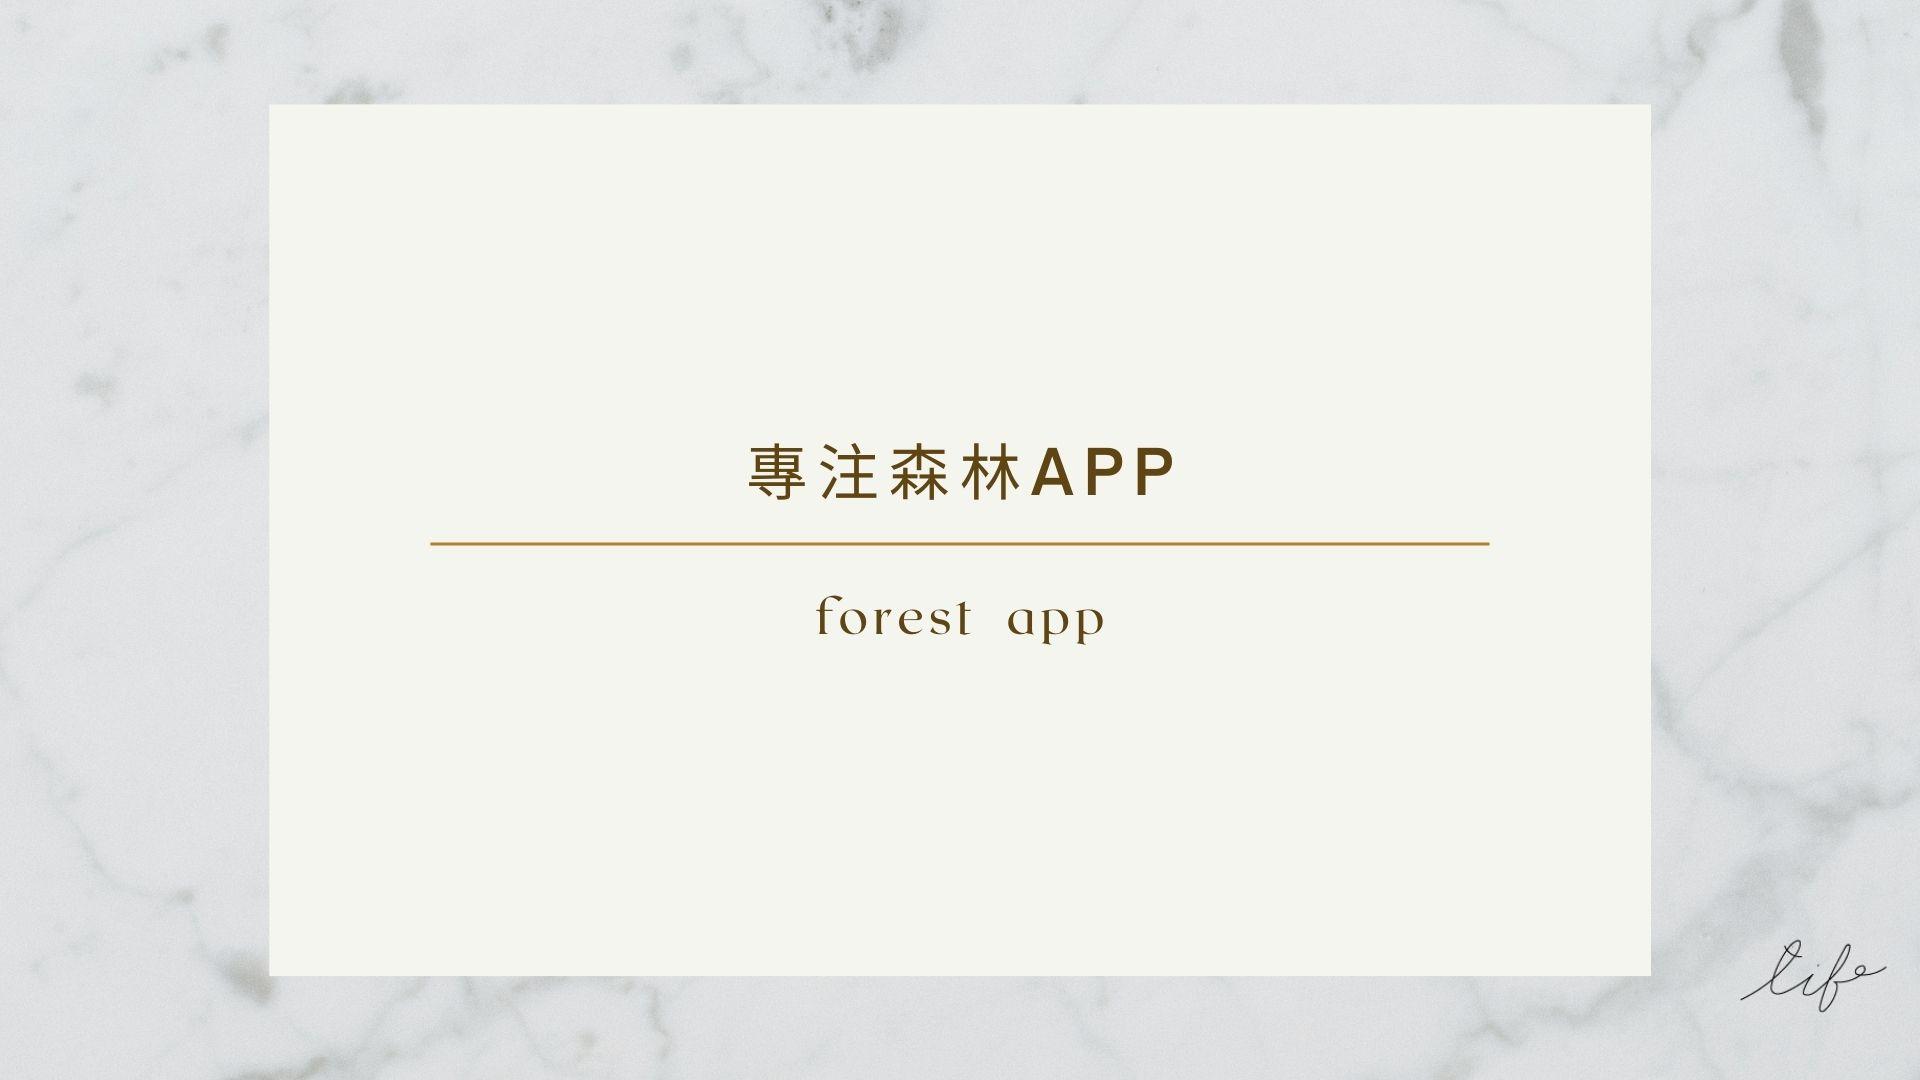 【Forest】專注森林,保持專注不分心,培養高效生活習慣